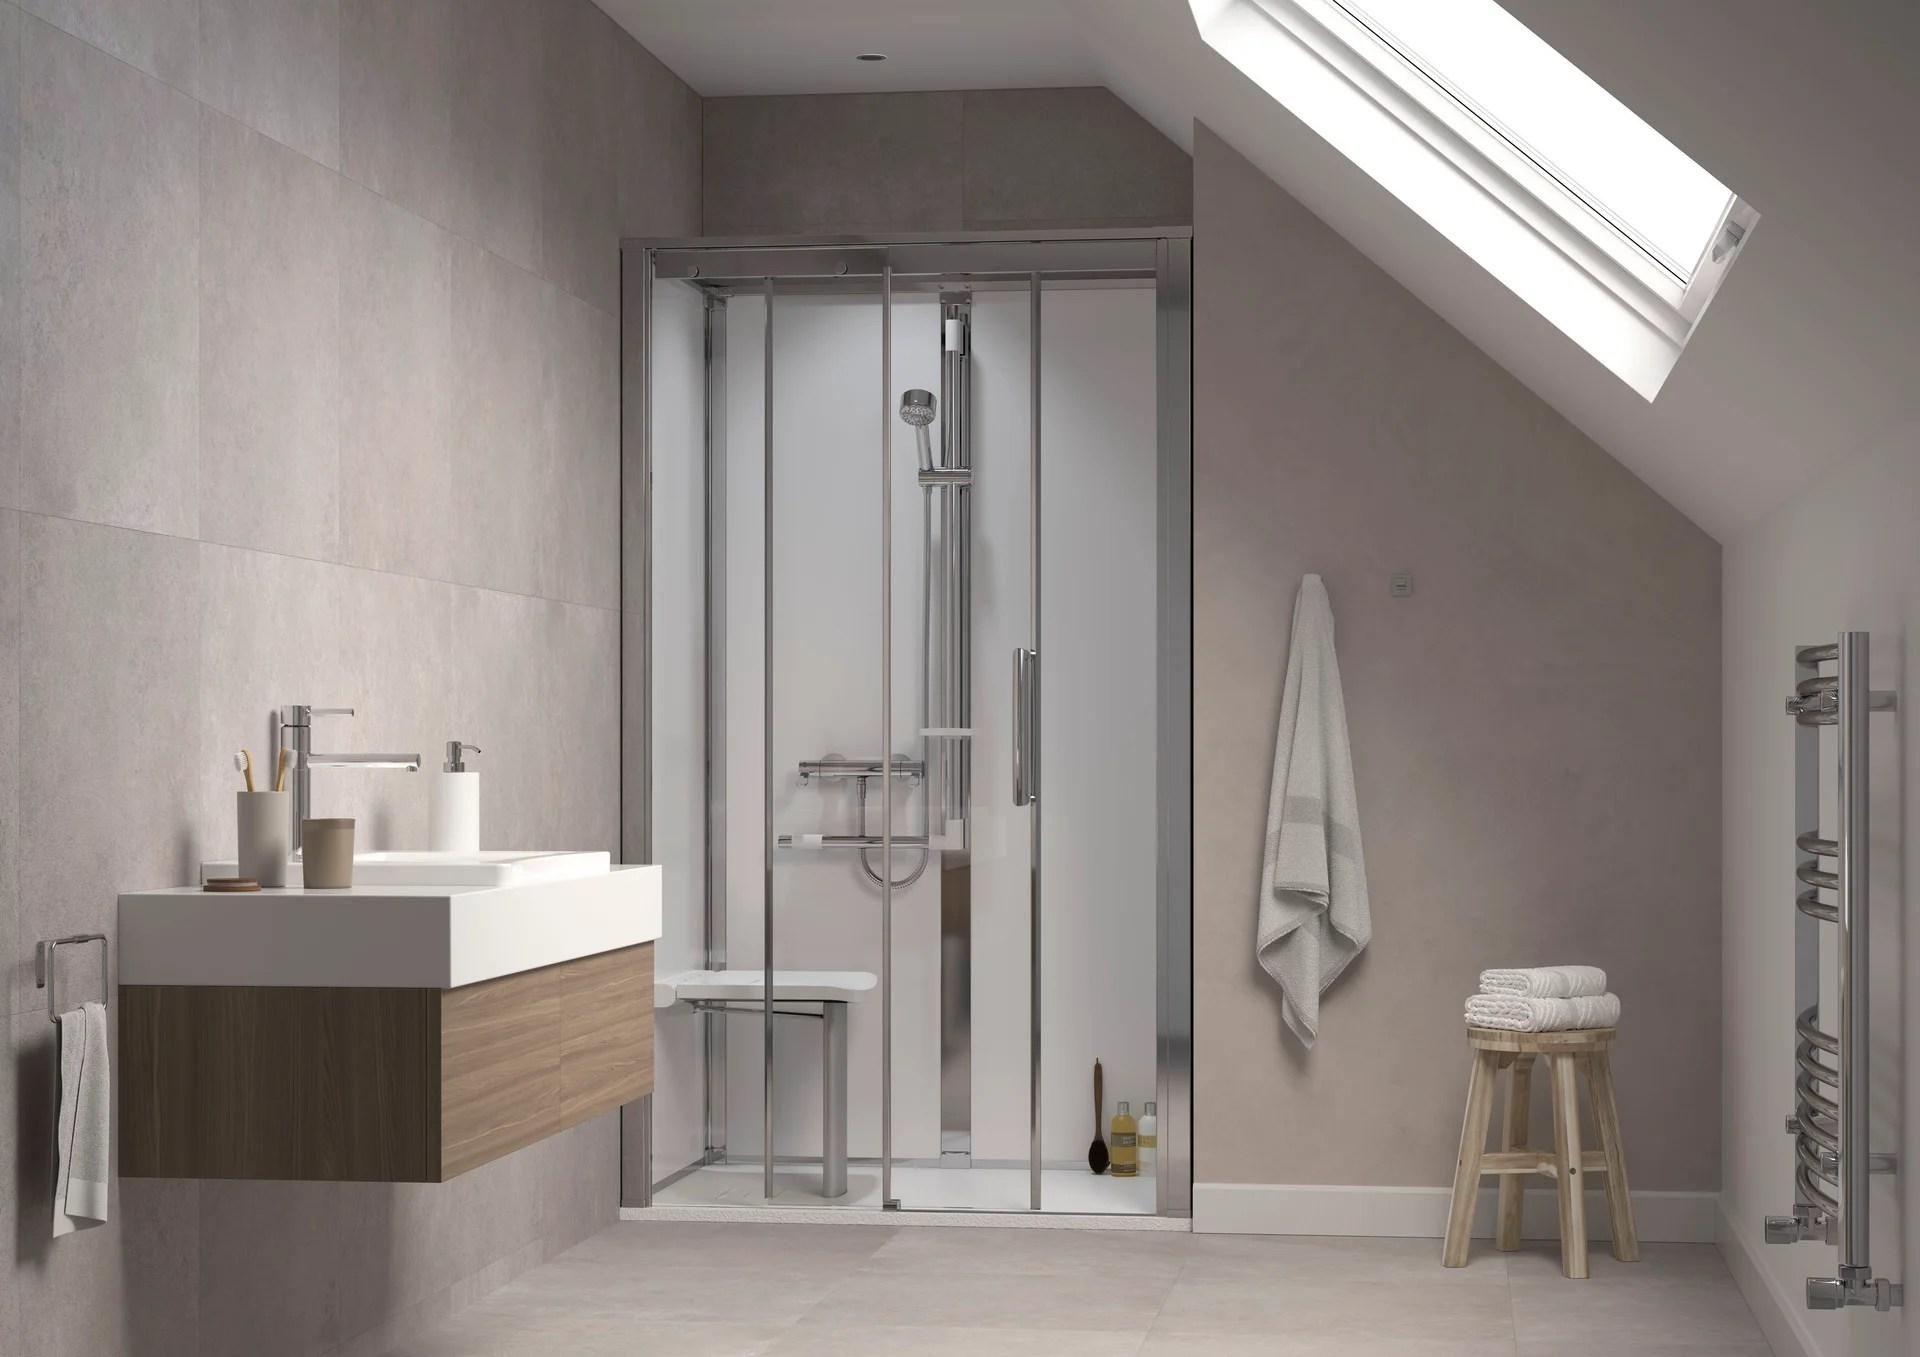 cabine de douche l 90 x l 120 cm blanc onyx pour niche porte pivotante gauche